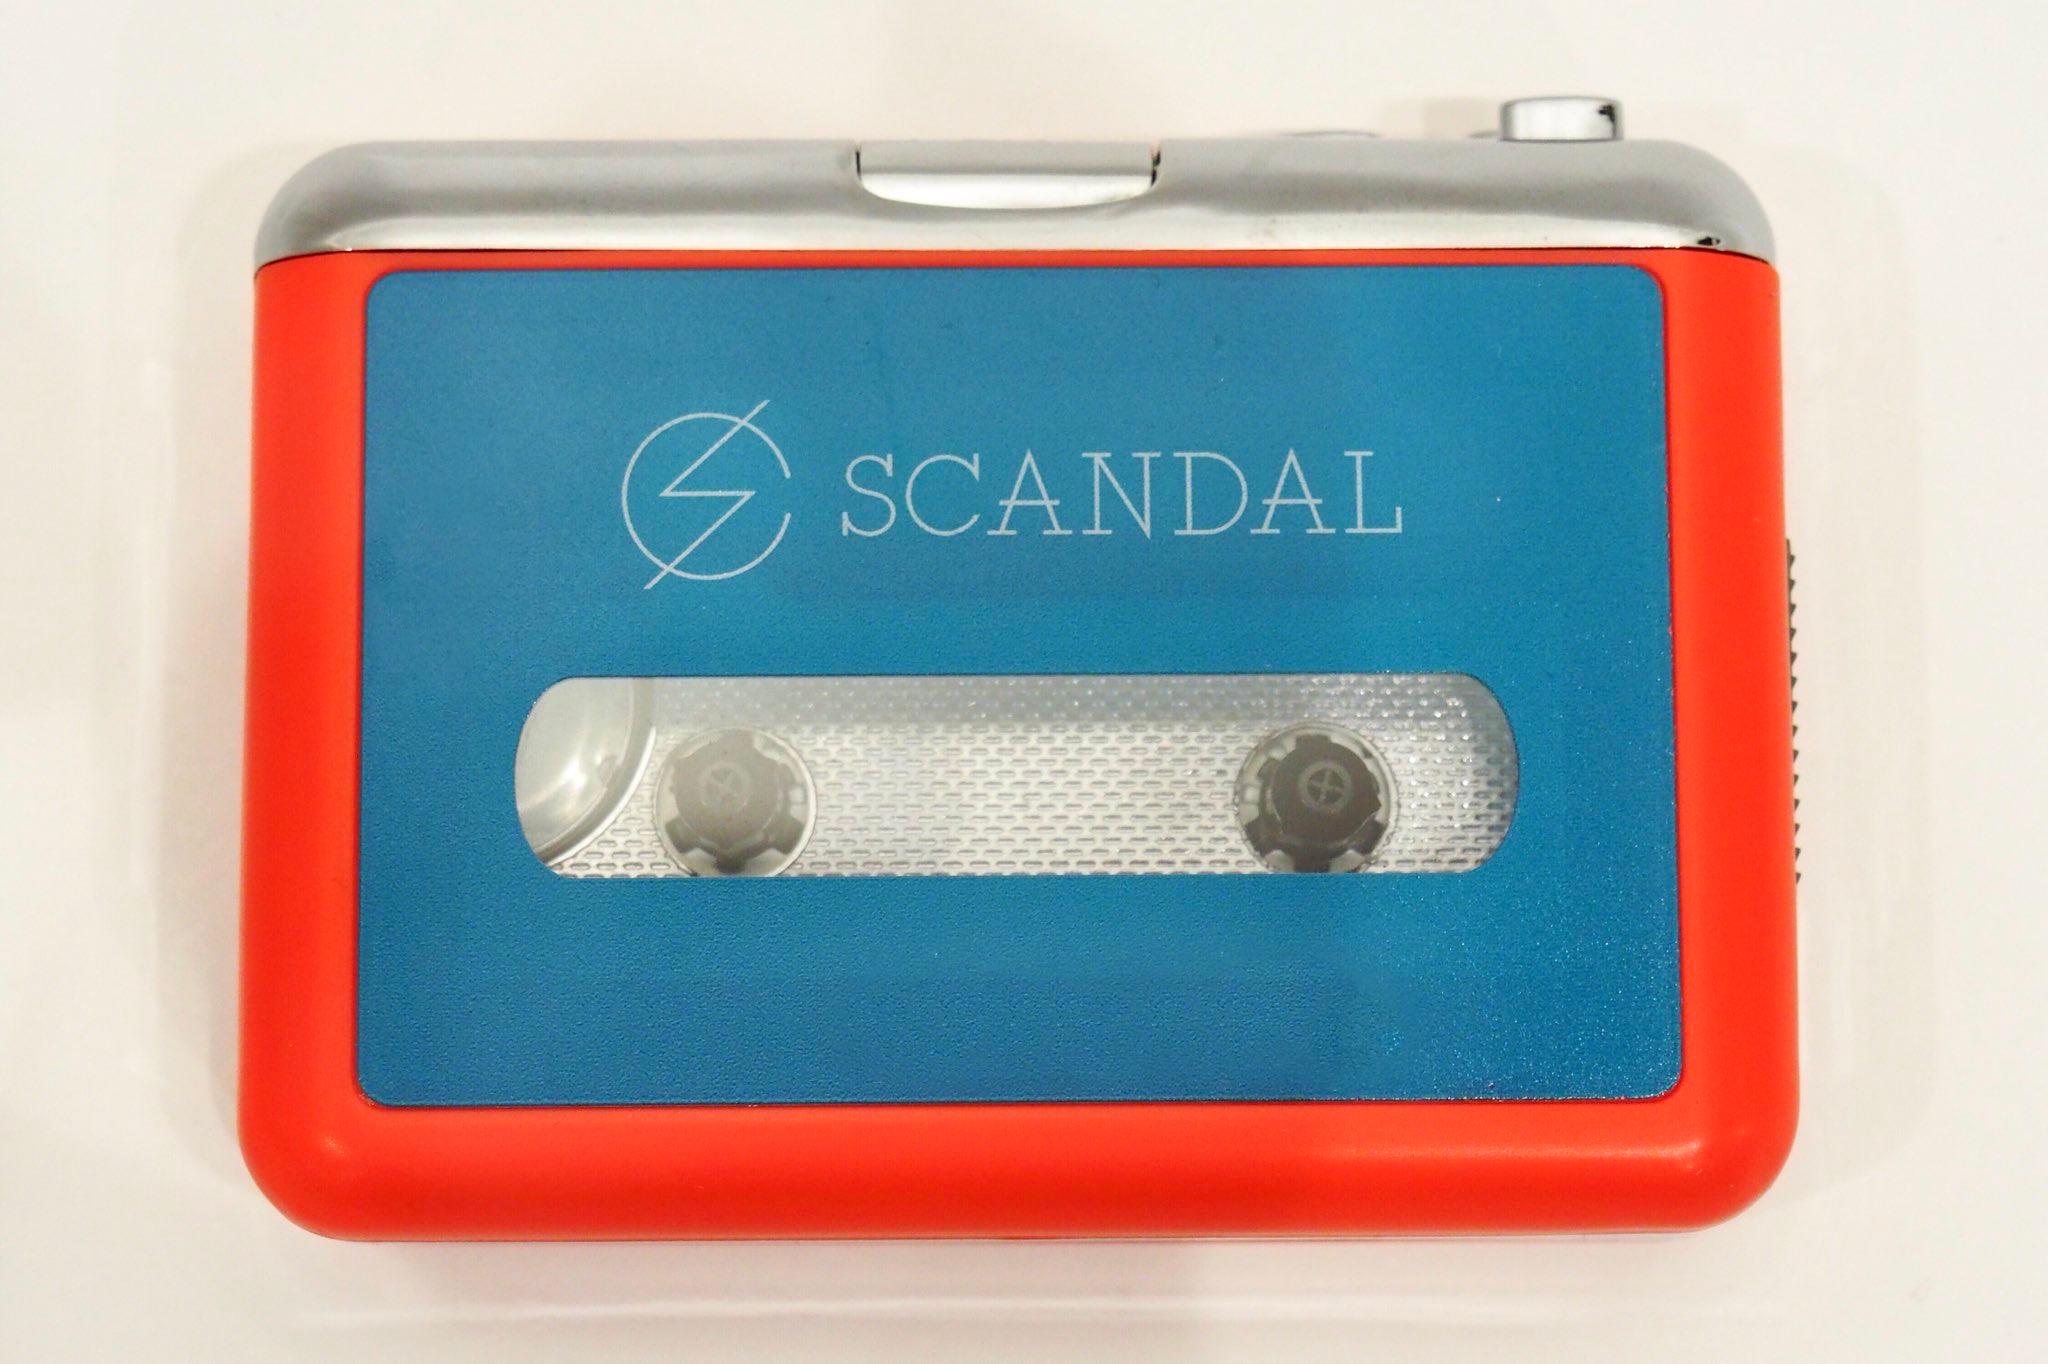 JRock247-SCANDAL-Cassette Store Day 2